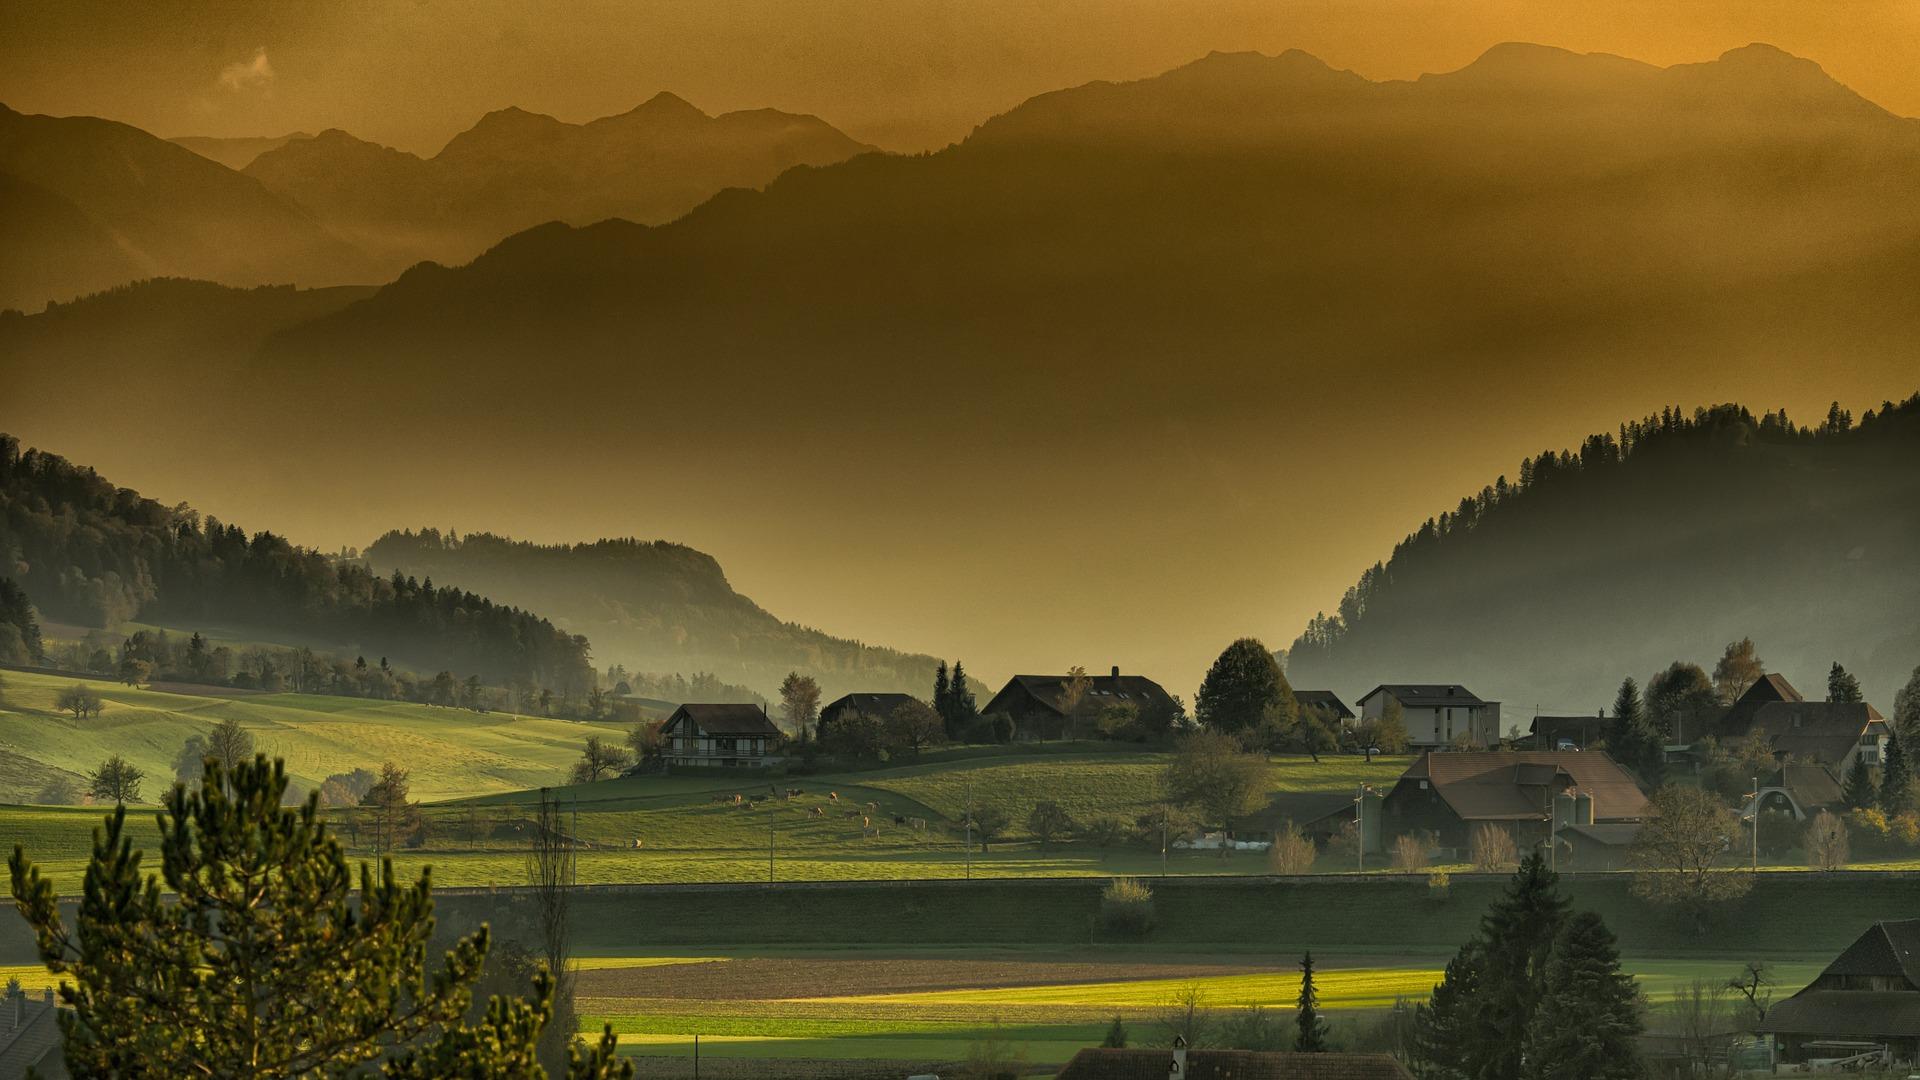 landscape-615428_1920_1.jpg